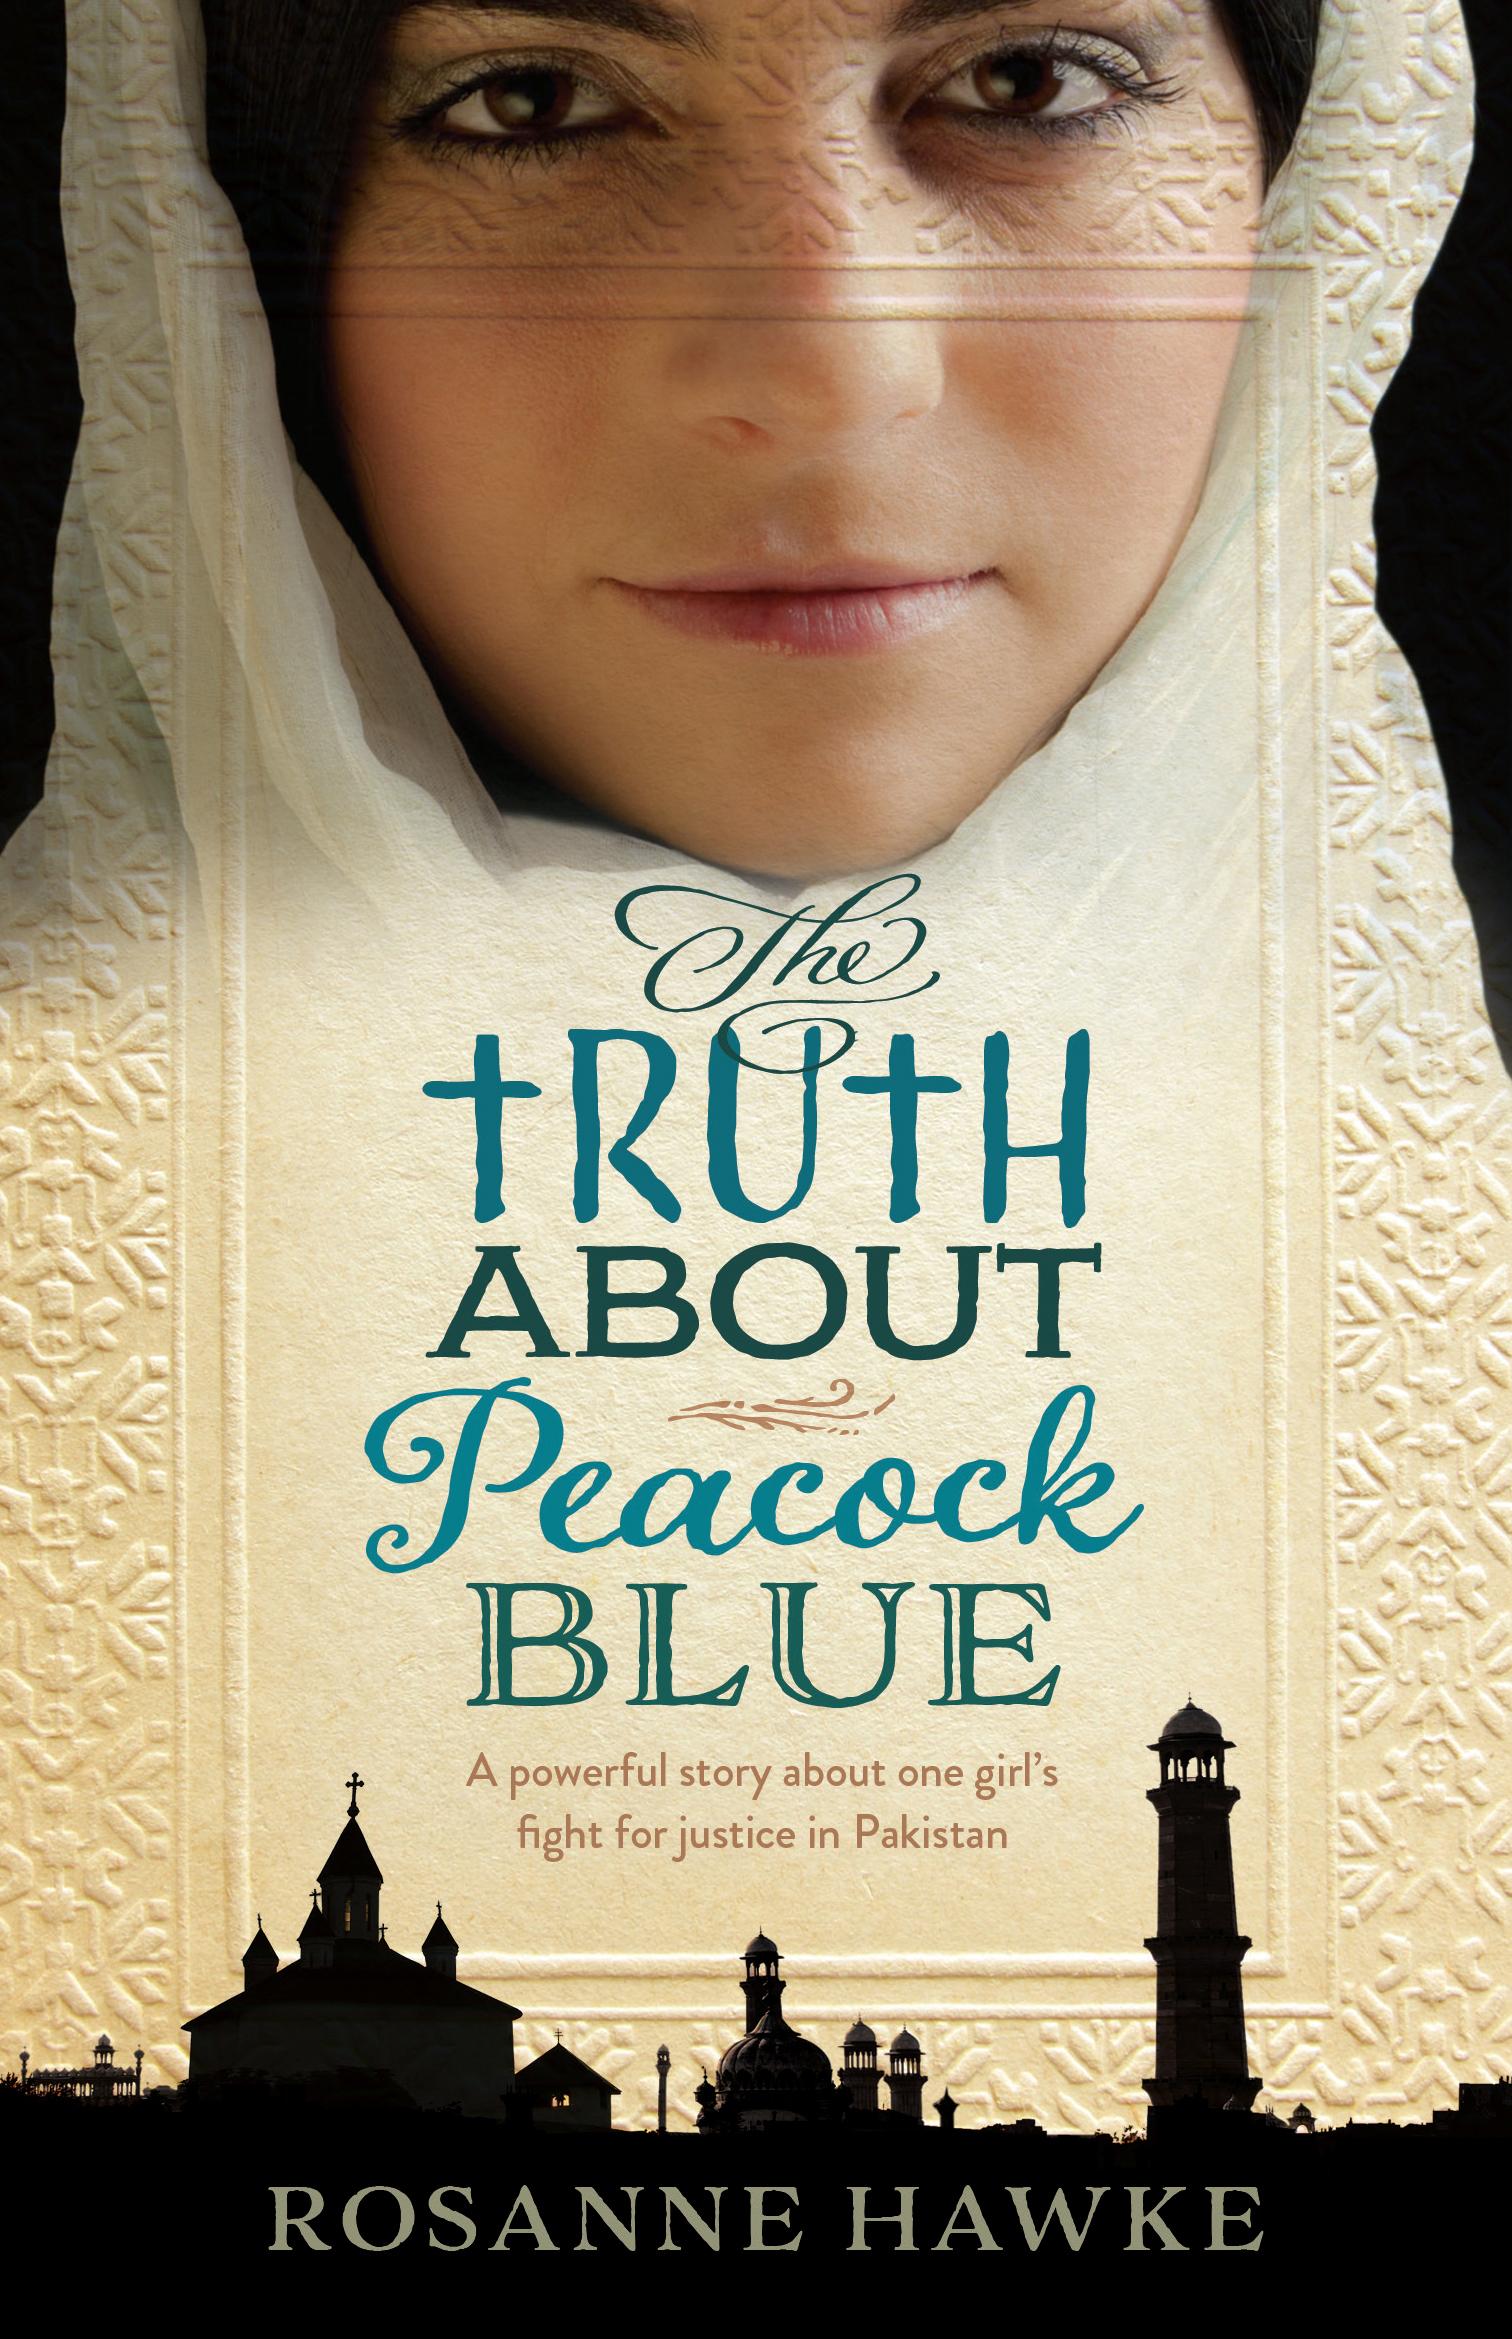 The Truth About Peacock Blue  Rosanne Hawke  9781743319949  Allen  Unwin  Australia